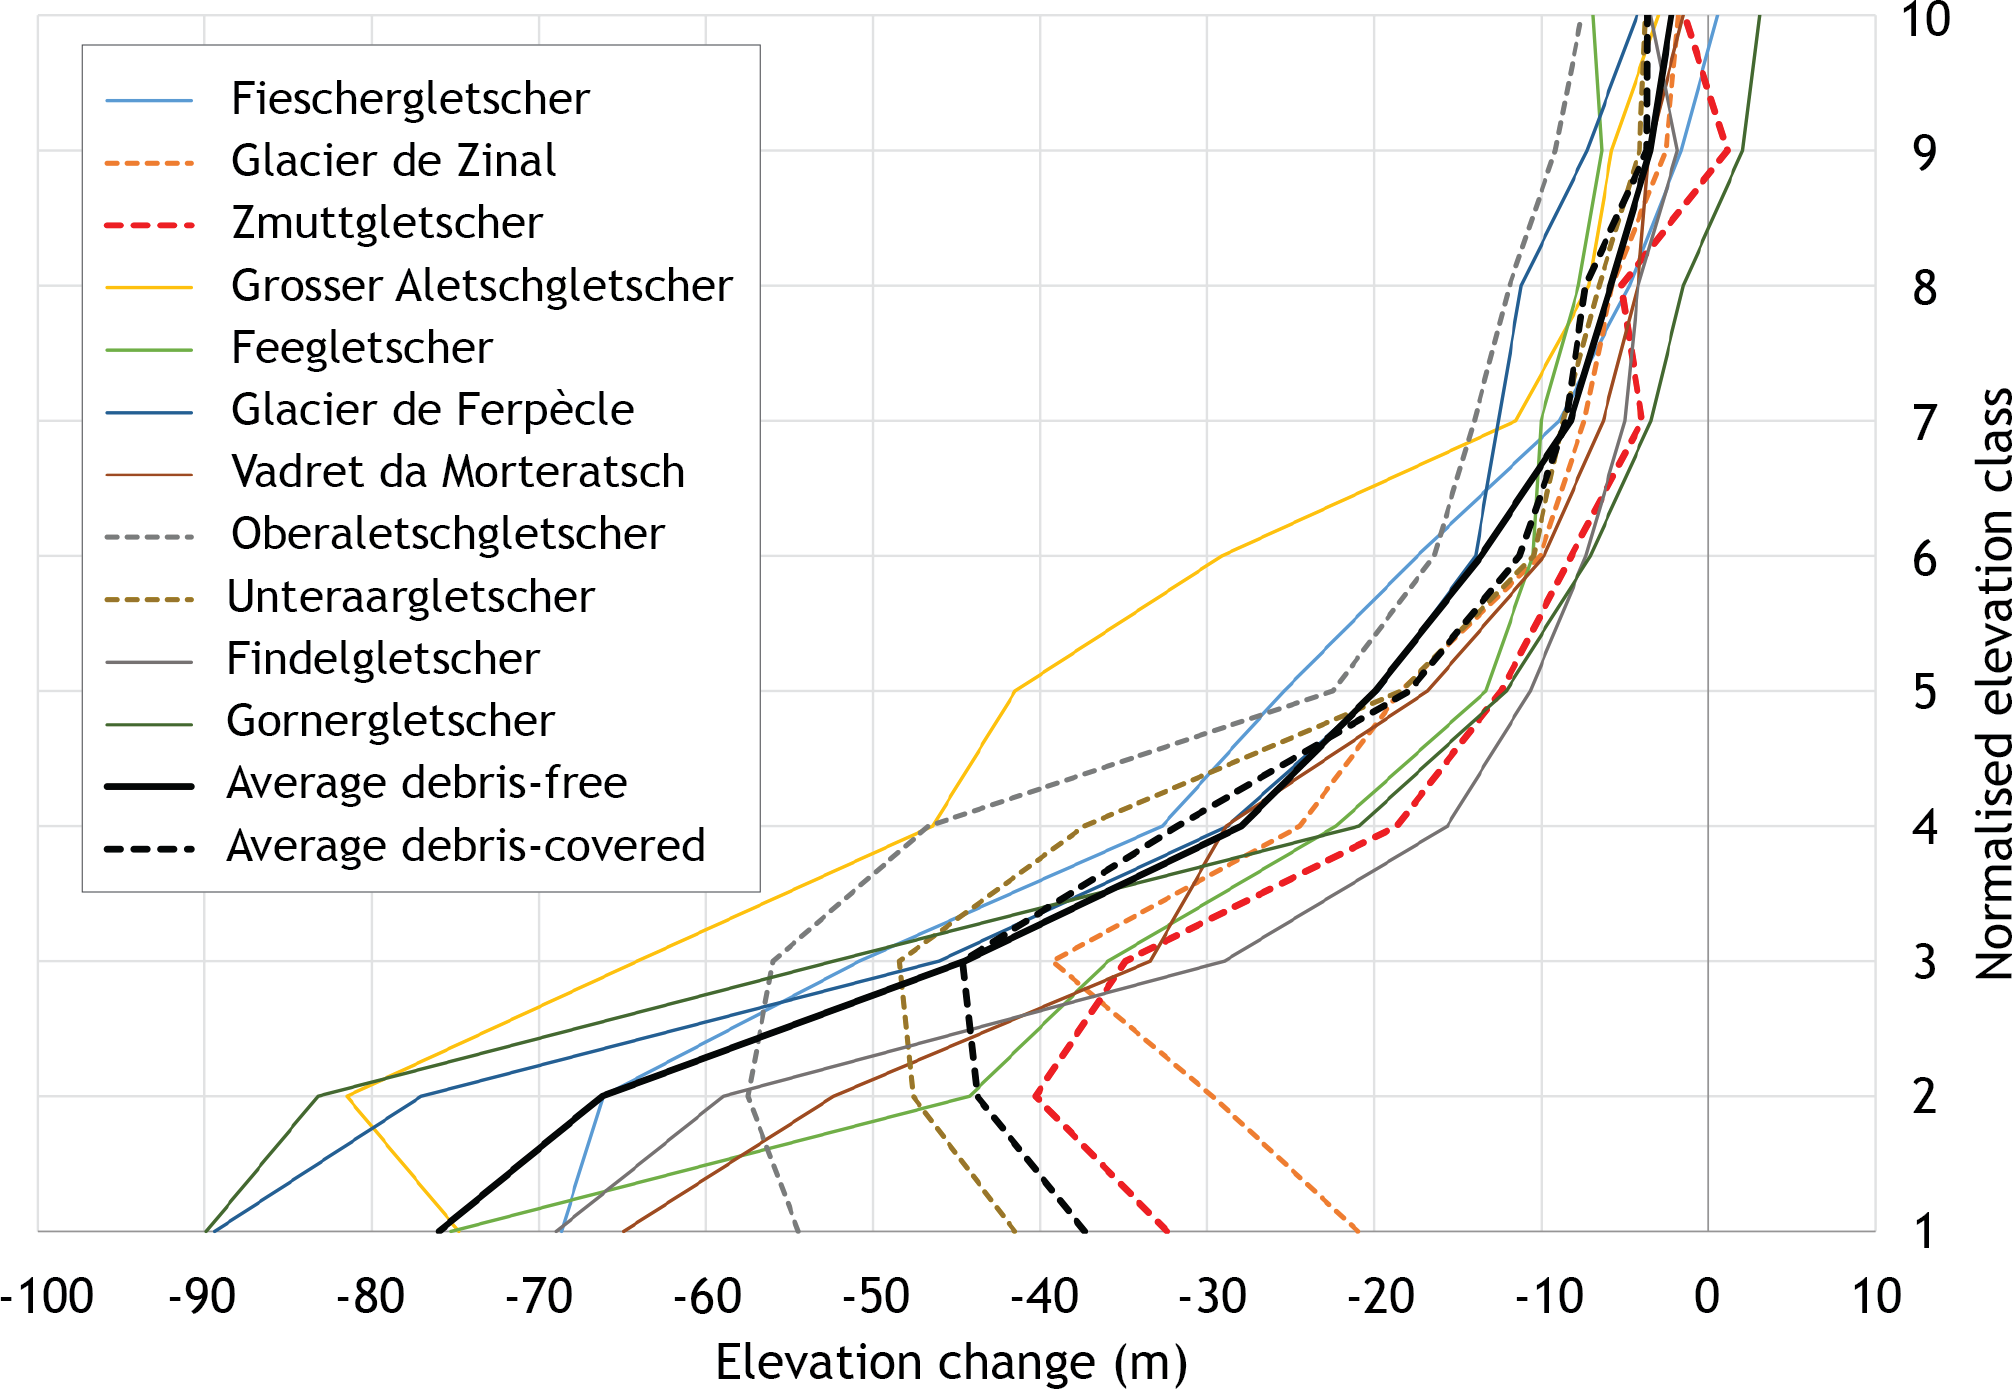 TC - Unravelling the evolution of Zmuttgletscher and its debris